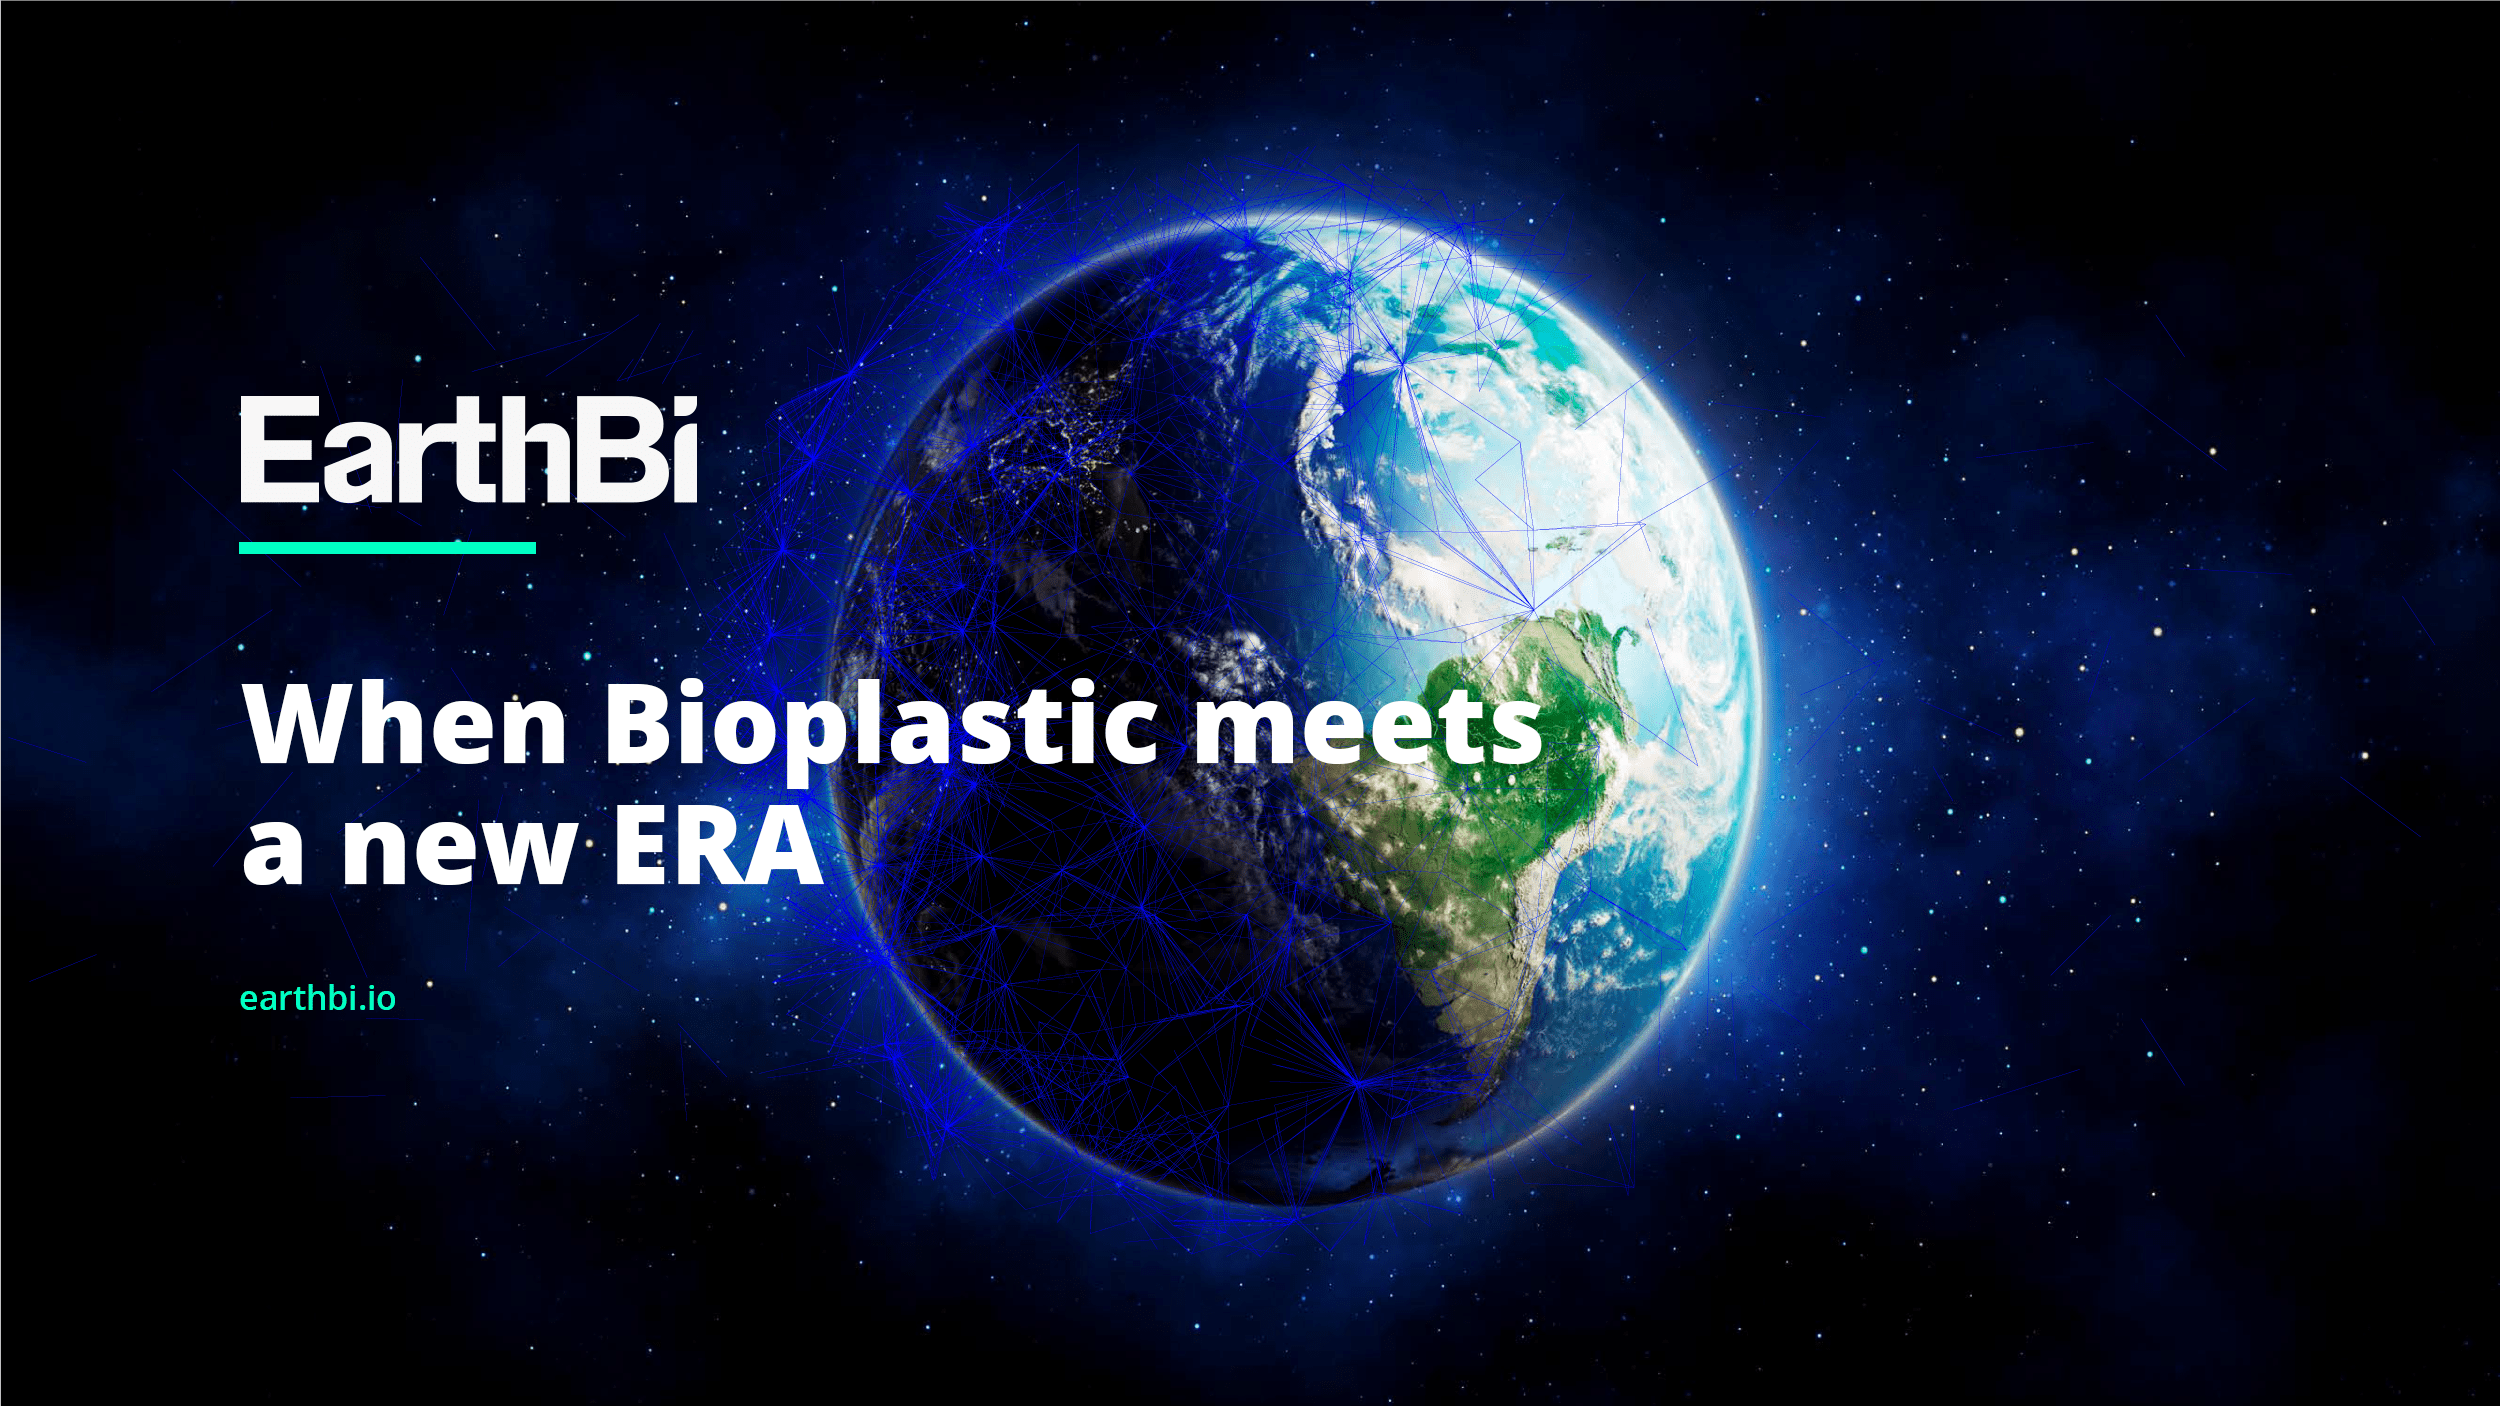 earthbi blockchain bioplastic